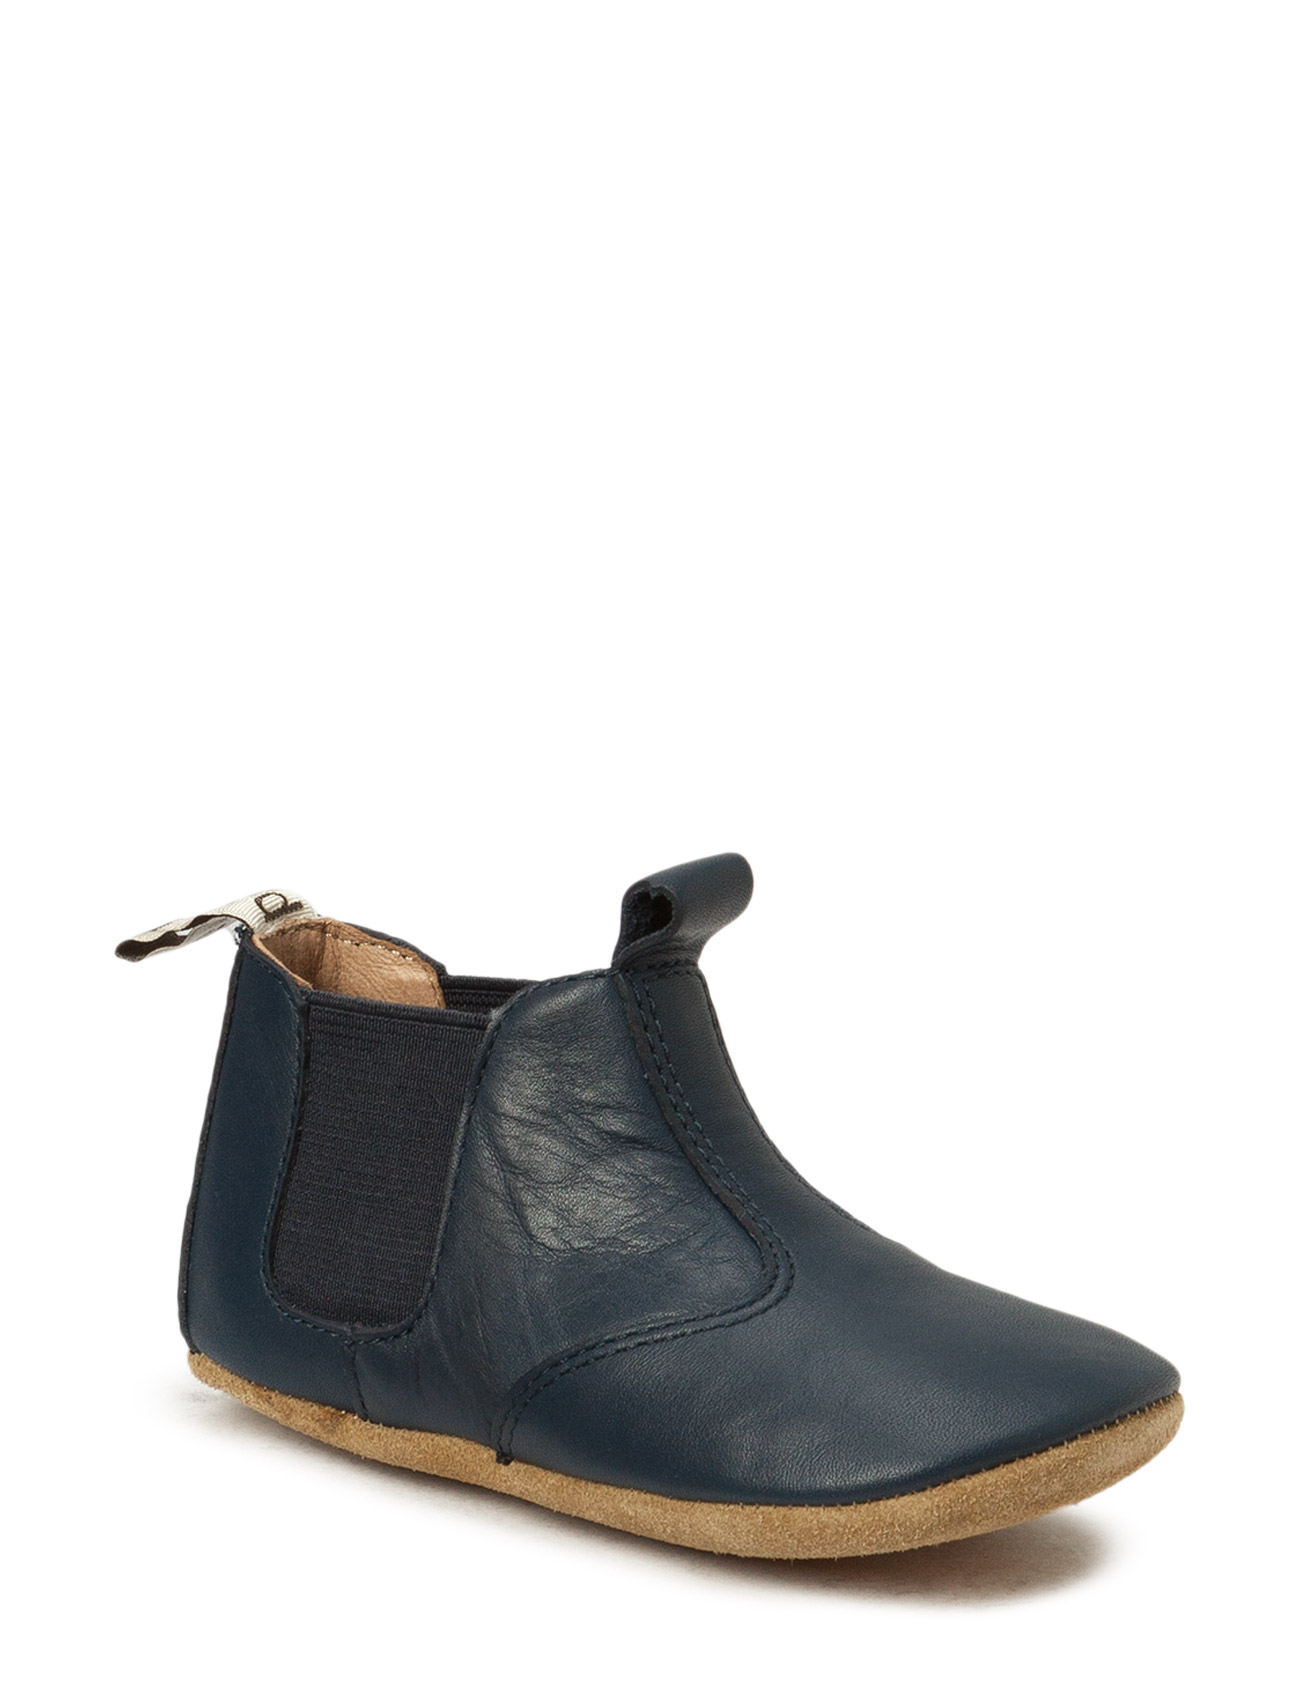 9a137d23ef3 Chelsea Home Shoe (21 Navy) (379 kr) - Bisgaard -   Boozt.com